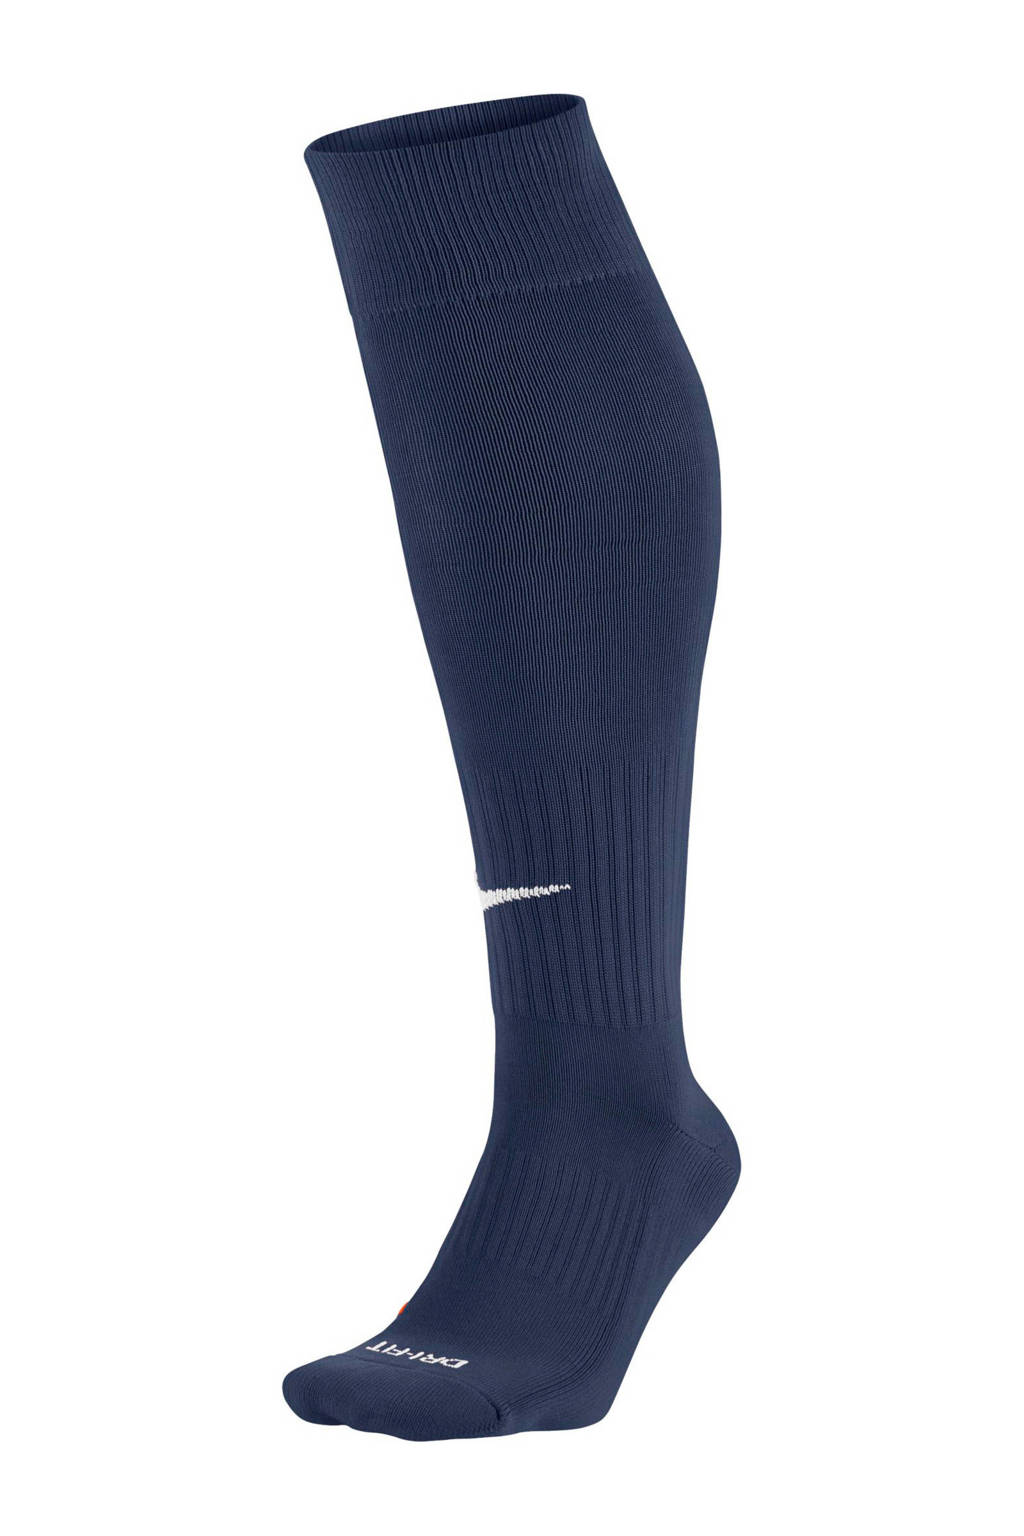 Nike   voetbalsokken donkerblauw, Donkerblauw/wit